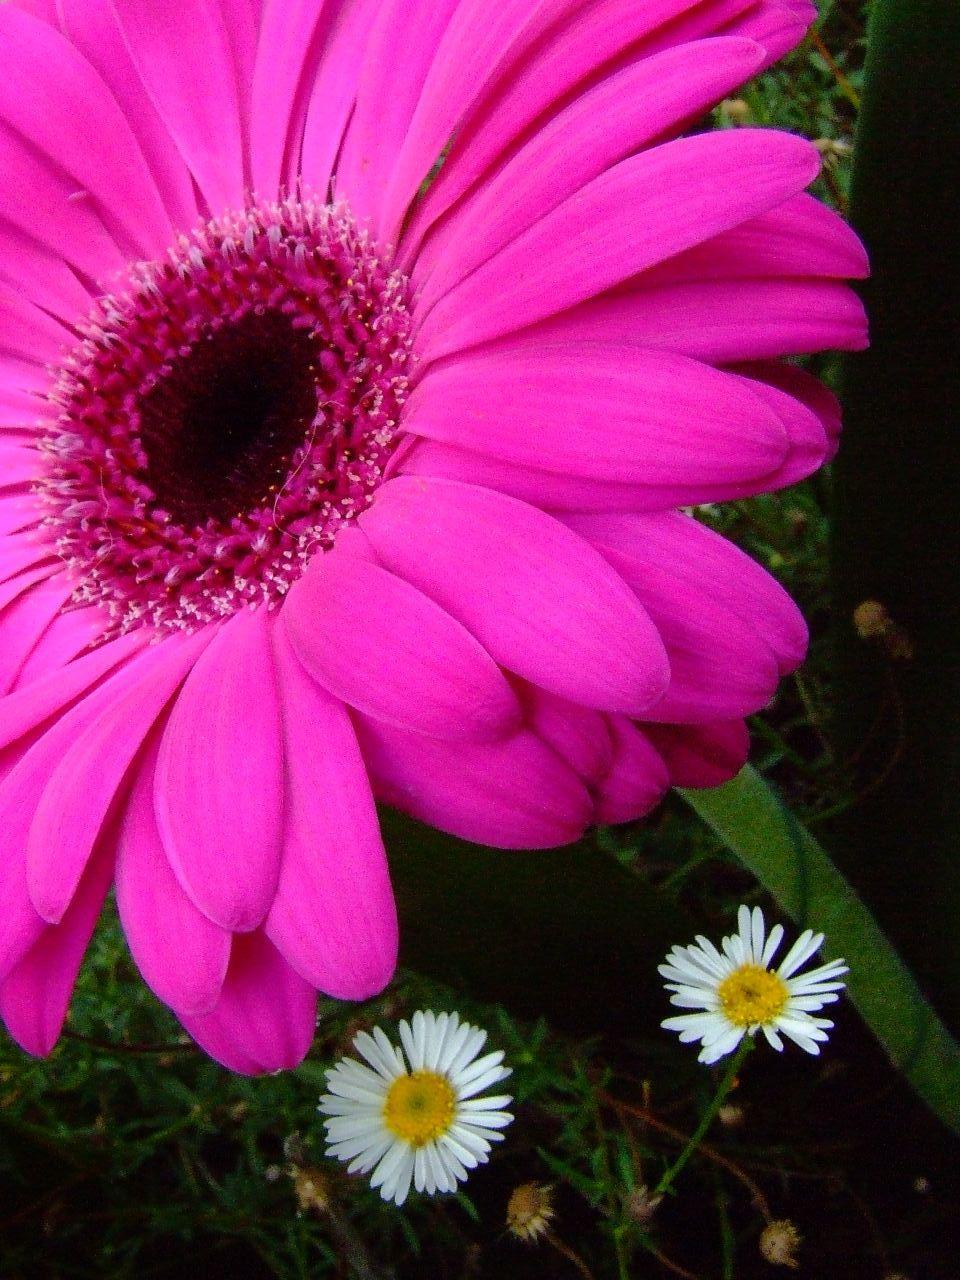 Gerbera Daisy Flower In My Backyard A Photo On Flickriver